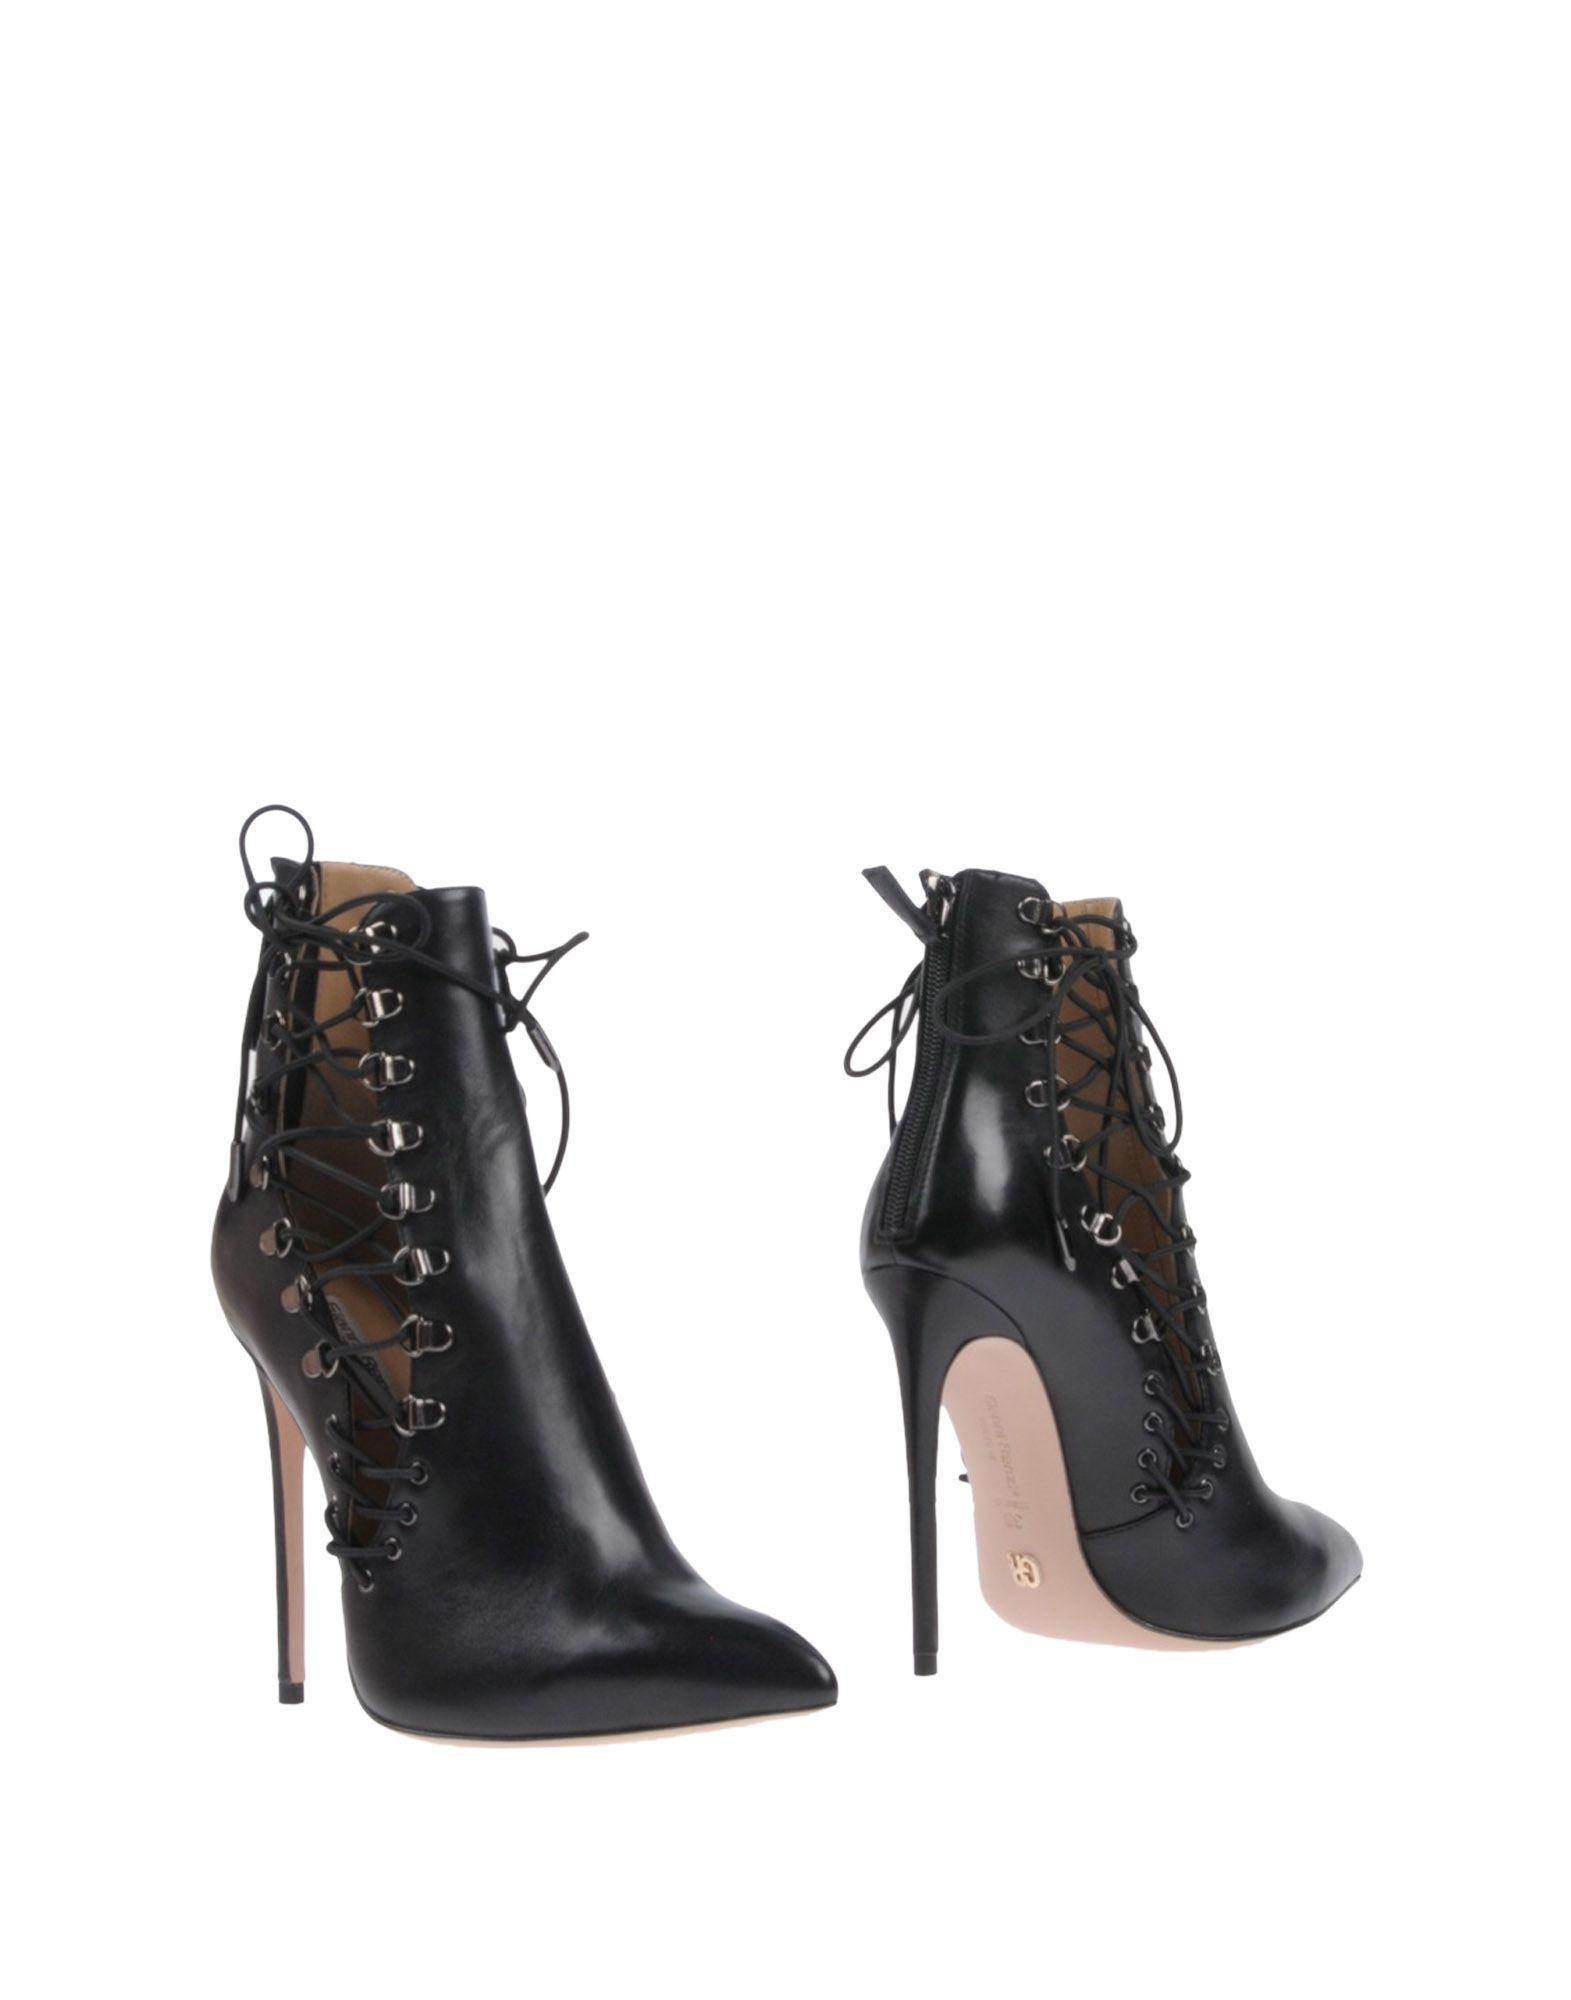 1dc10c35e Gianni Renzi  174  Couture Ankle Boot - Women Gianni Renzi  174  Couture  Ankle Boots online on United Kingdom - 11455109IG 91e591